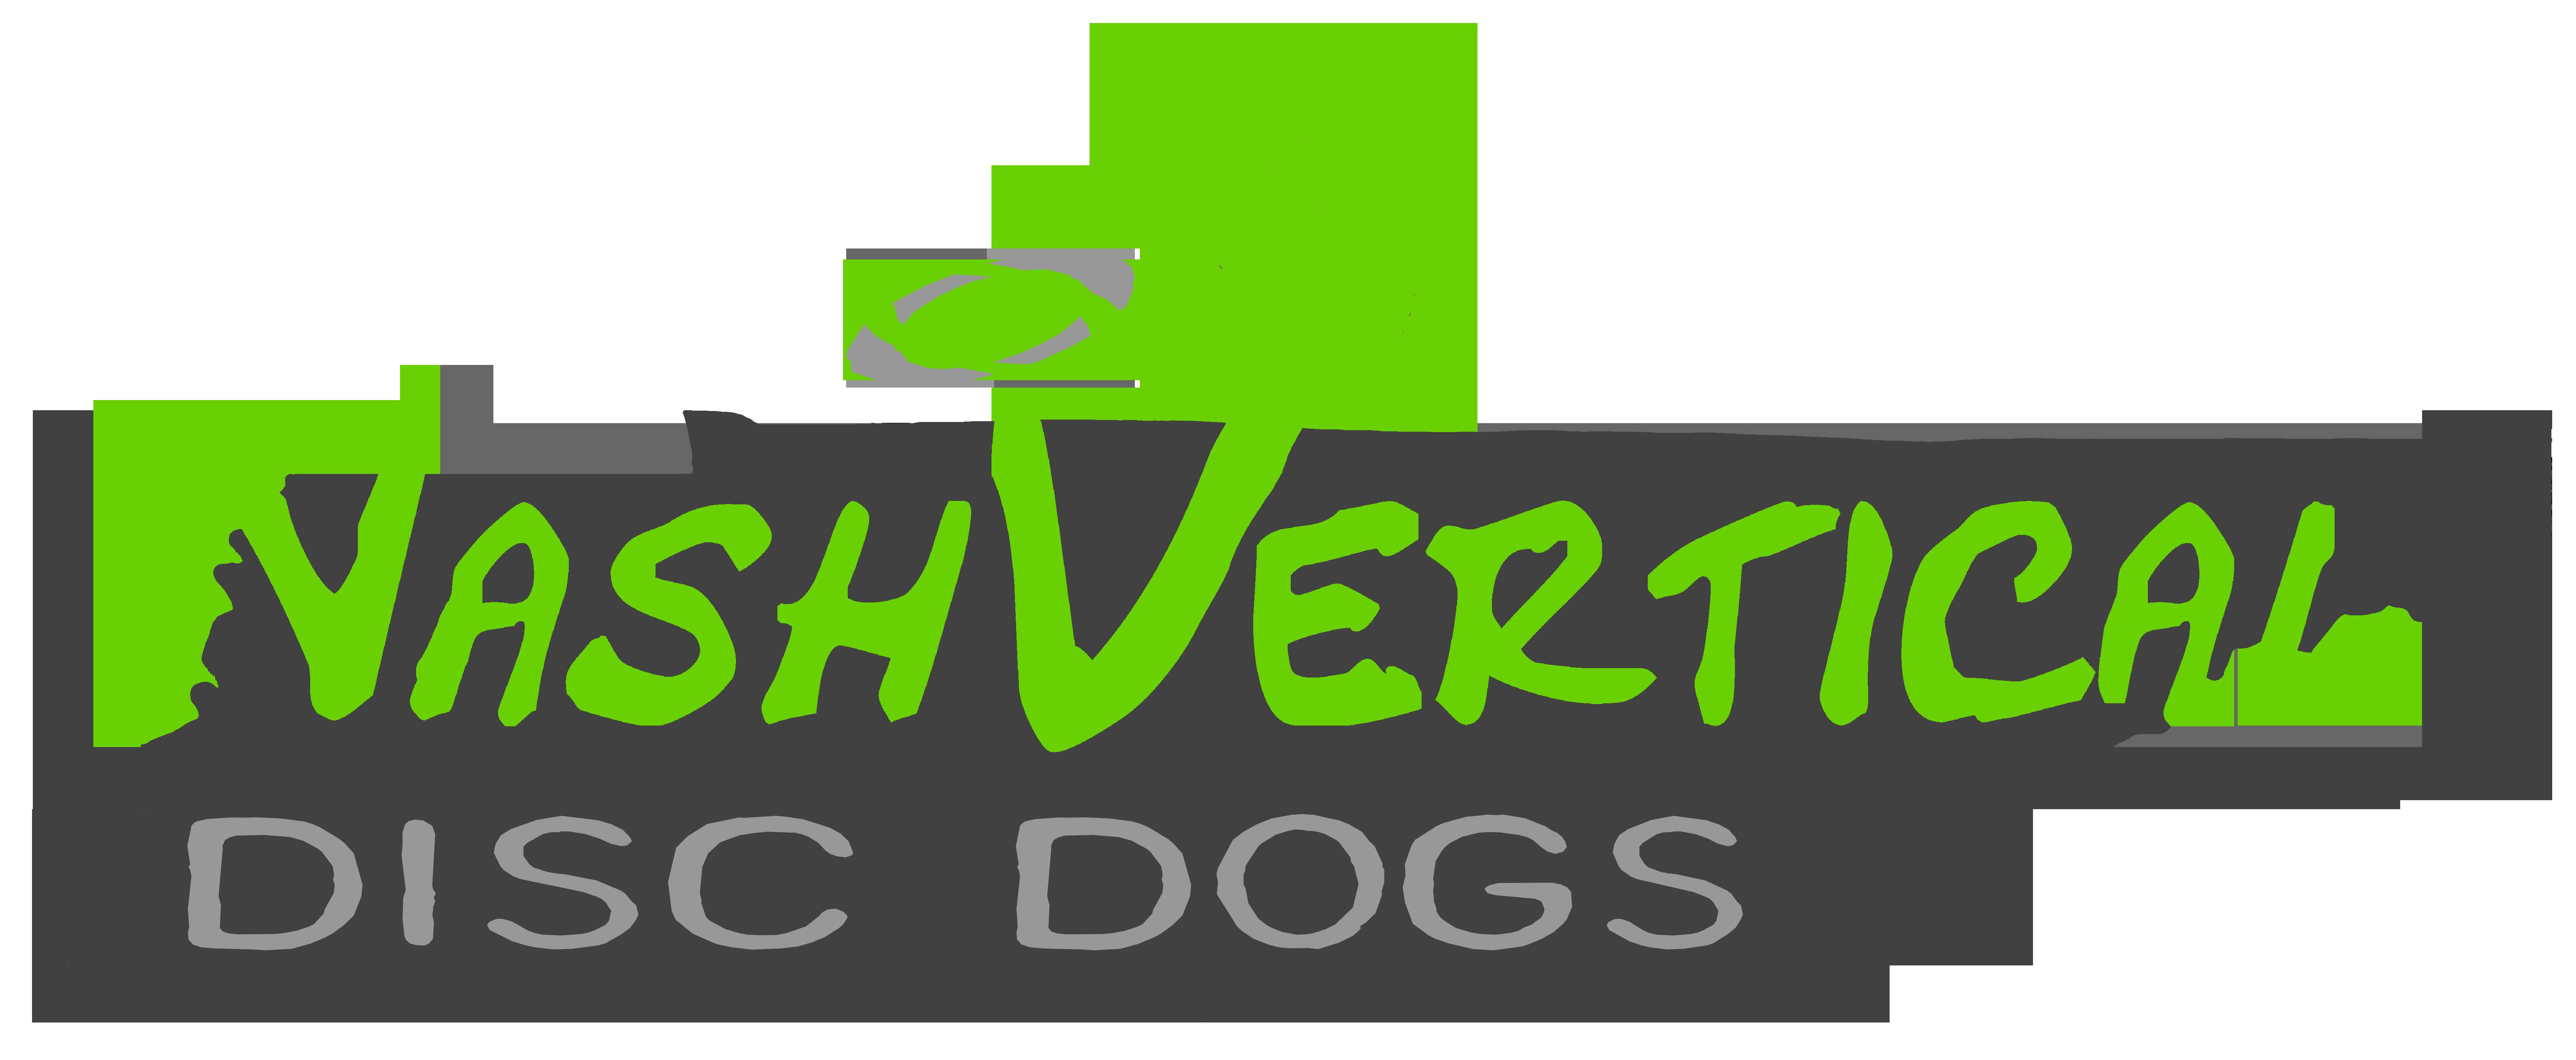 NashVertical Disc Dogs Logo